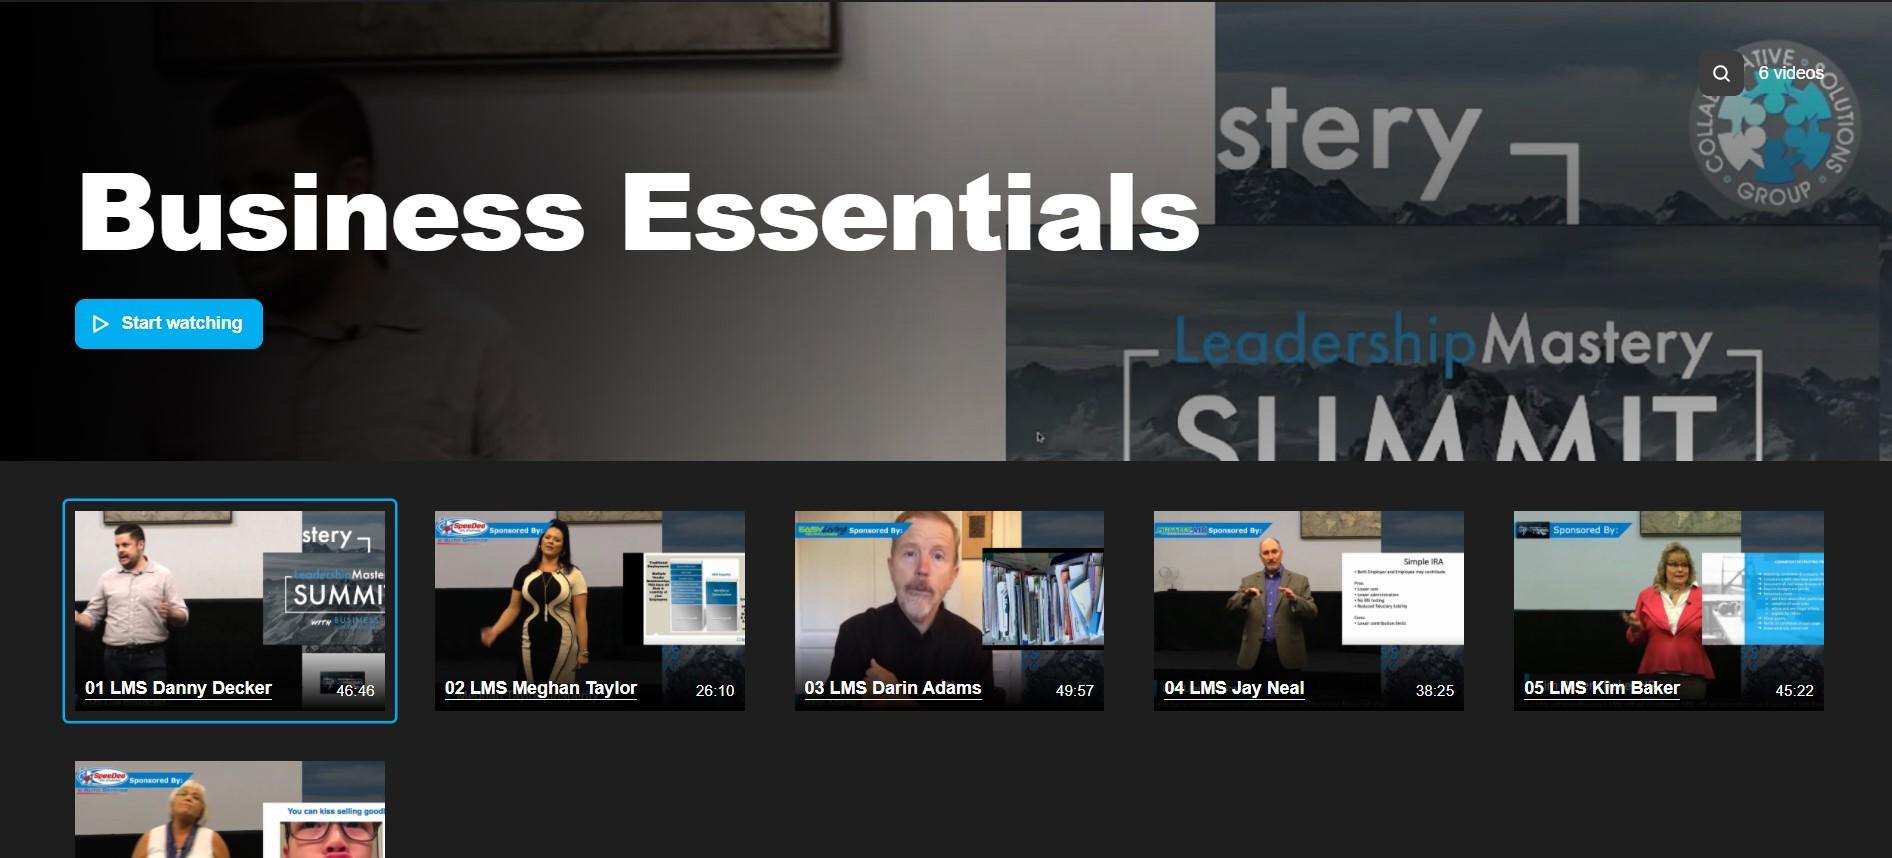 Business Essentials Video Course